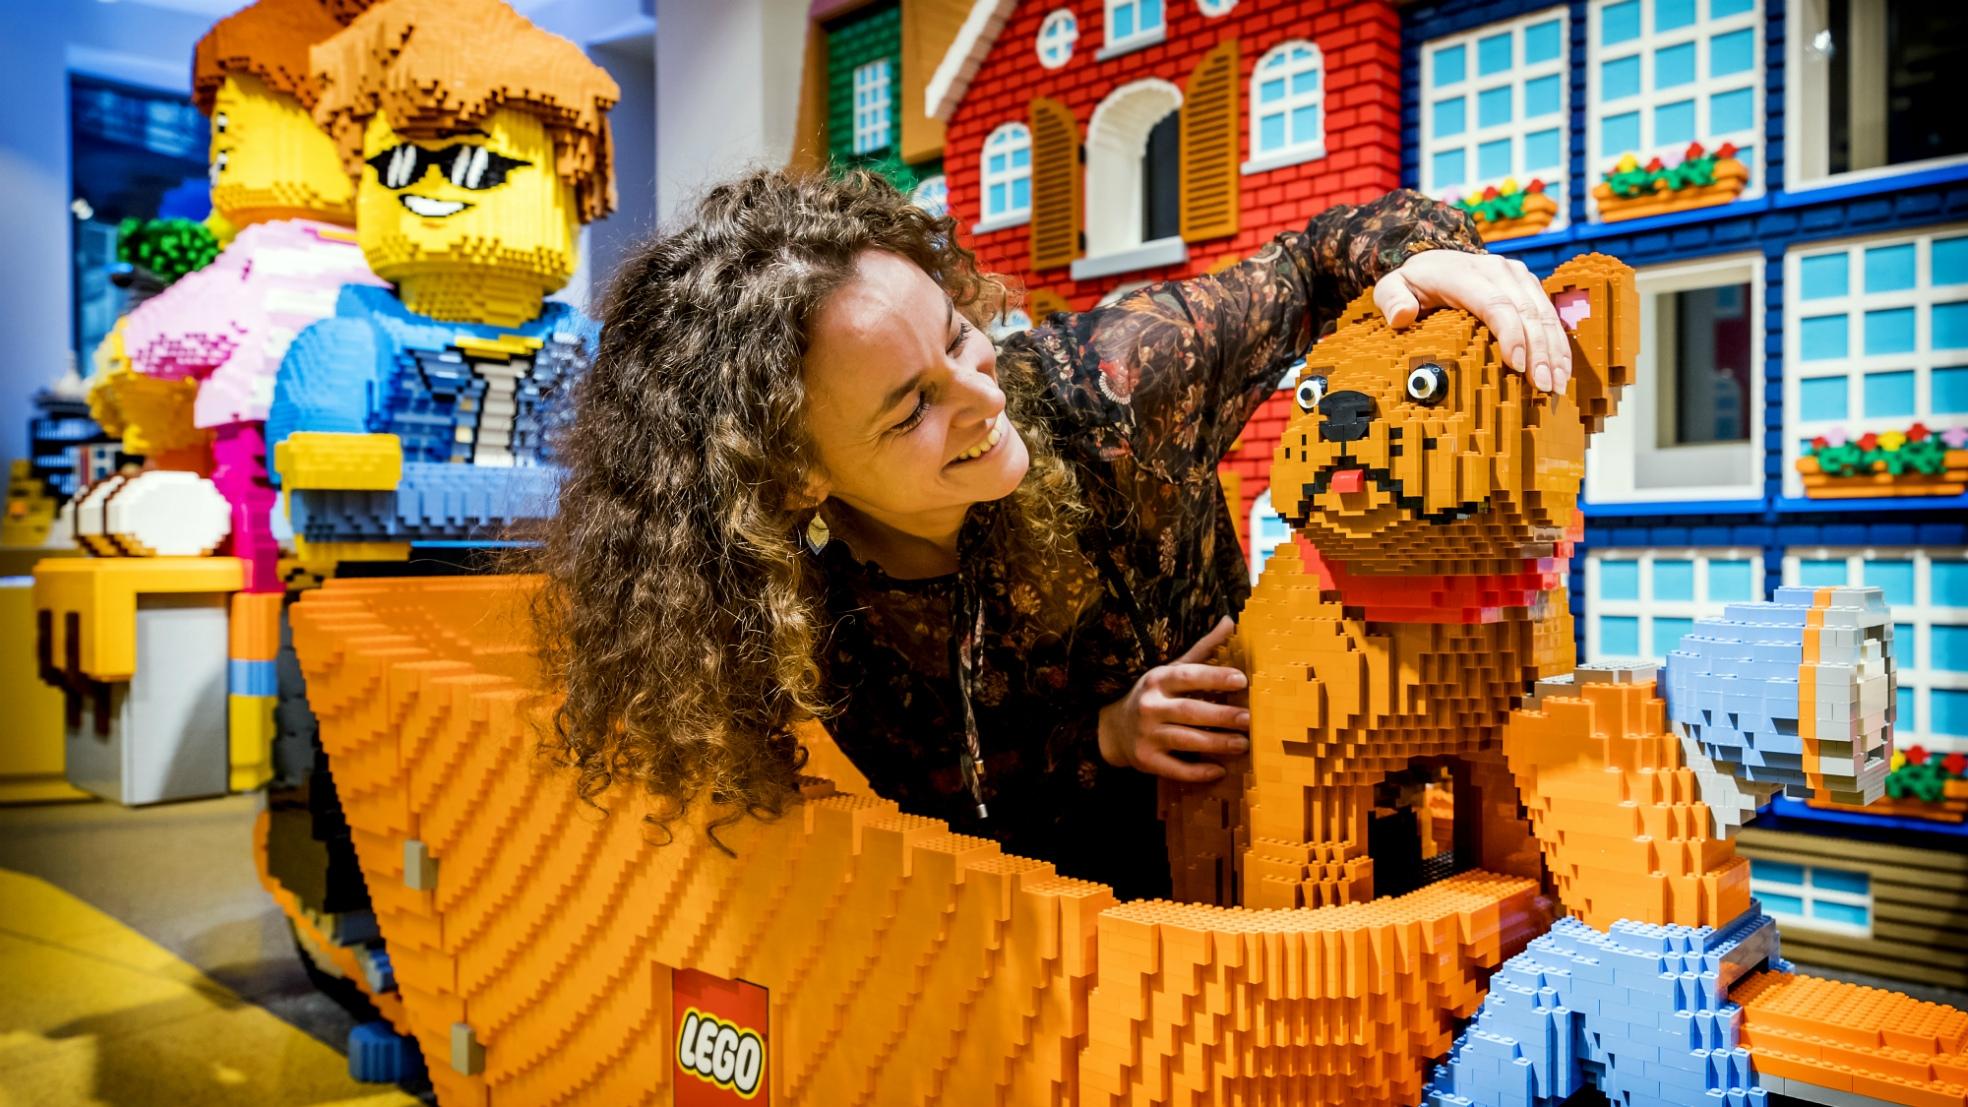 Legowinkel Amsterdam 2